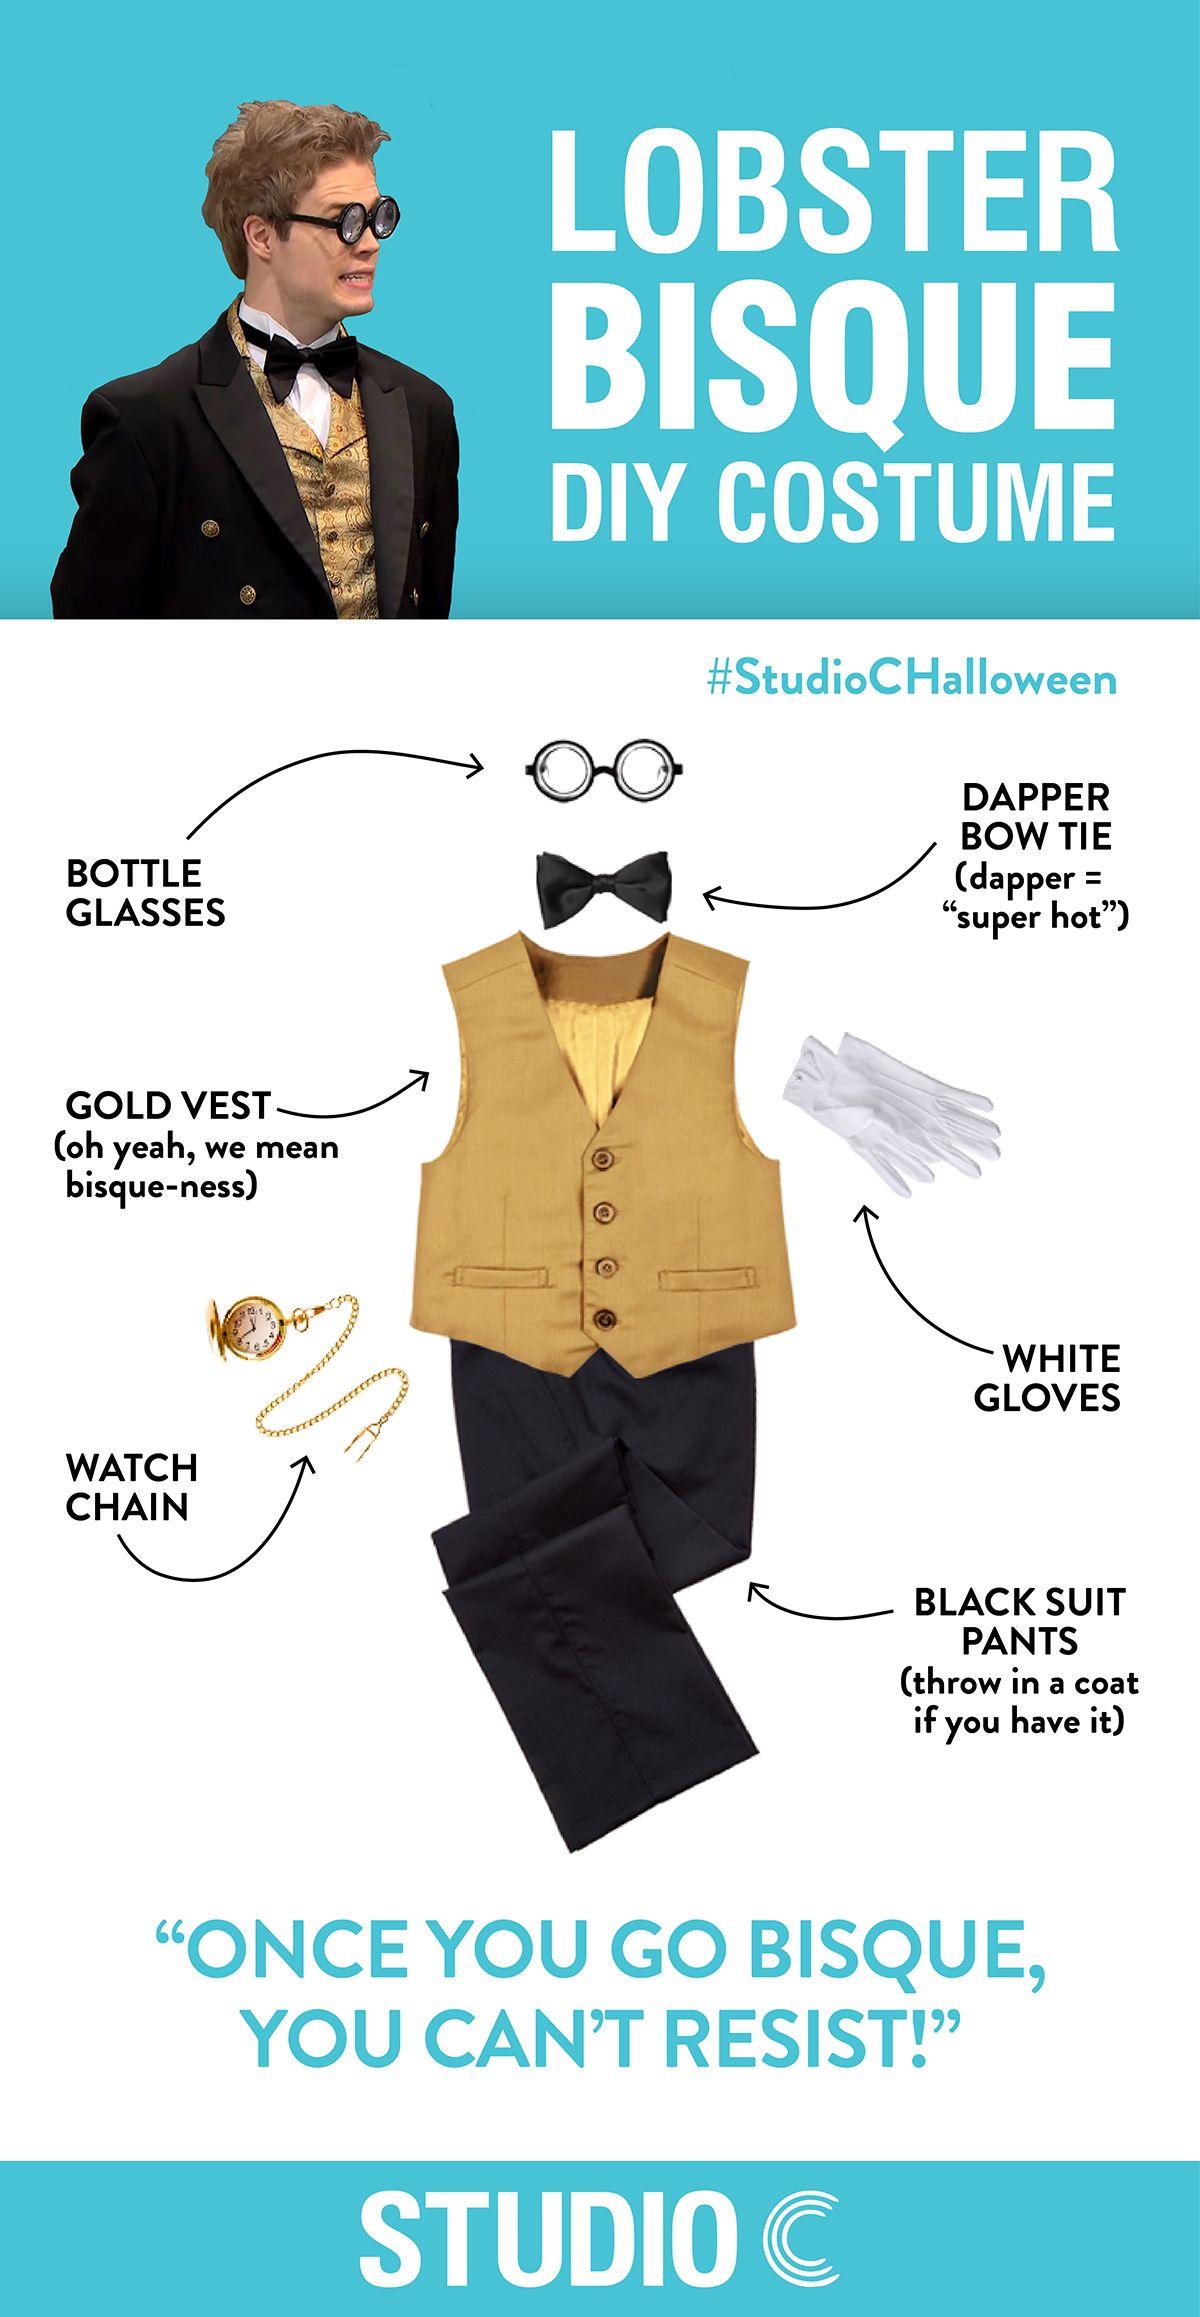 DIY Costume - Lobster Bisque | Studio C | Pinterest | Lobster bisque, Diy costumes and Costumes